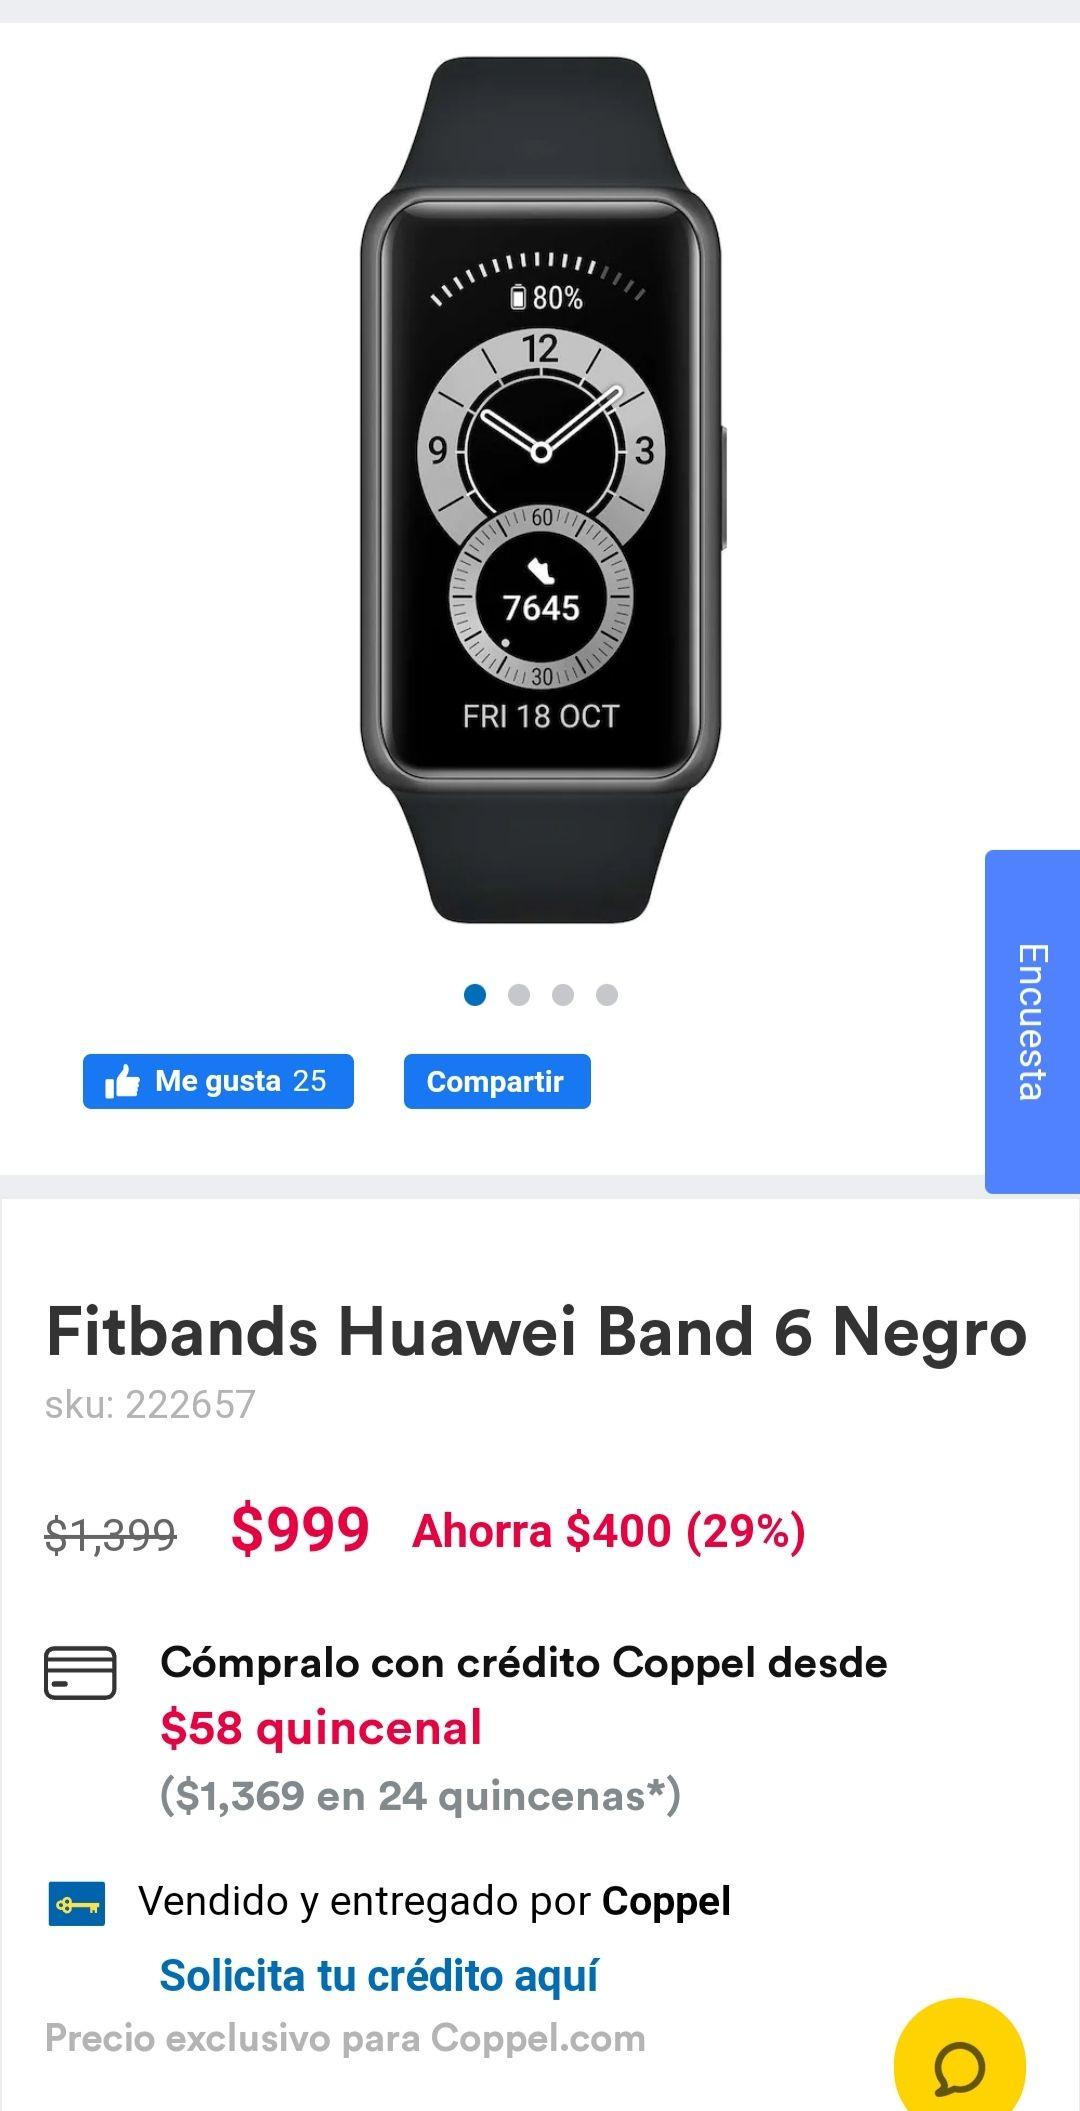 Coppel: Huawei Band 6 negro